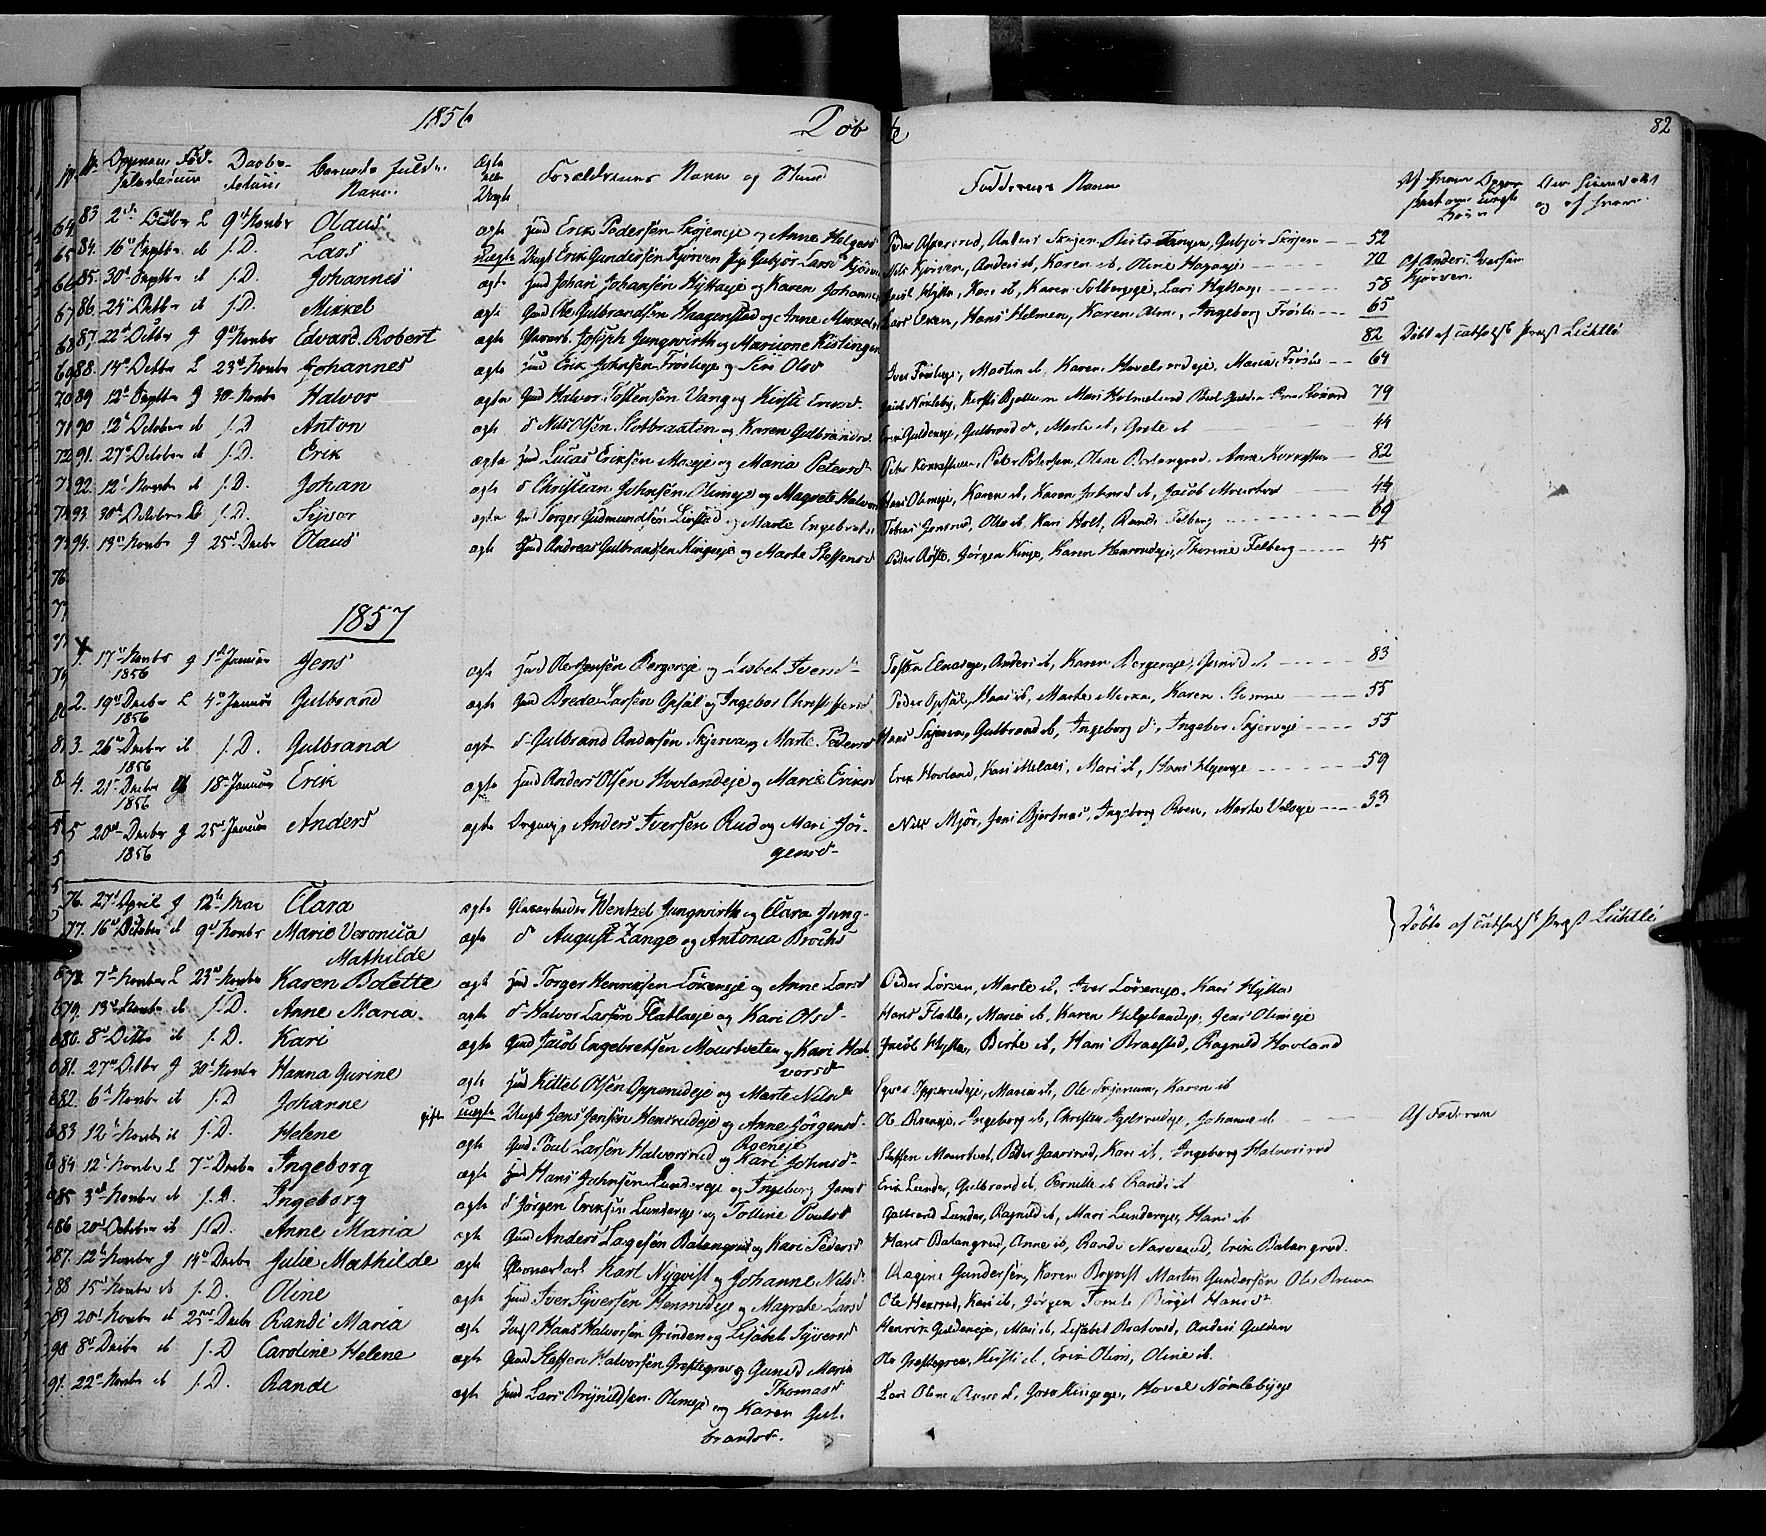 SAH, Jevnaker prestekontor, Ministerialbok nr. 6, 1837-1857, s. 82